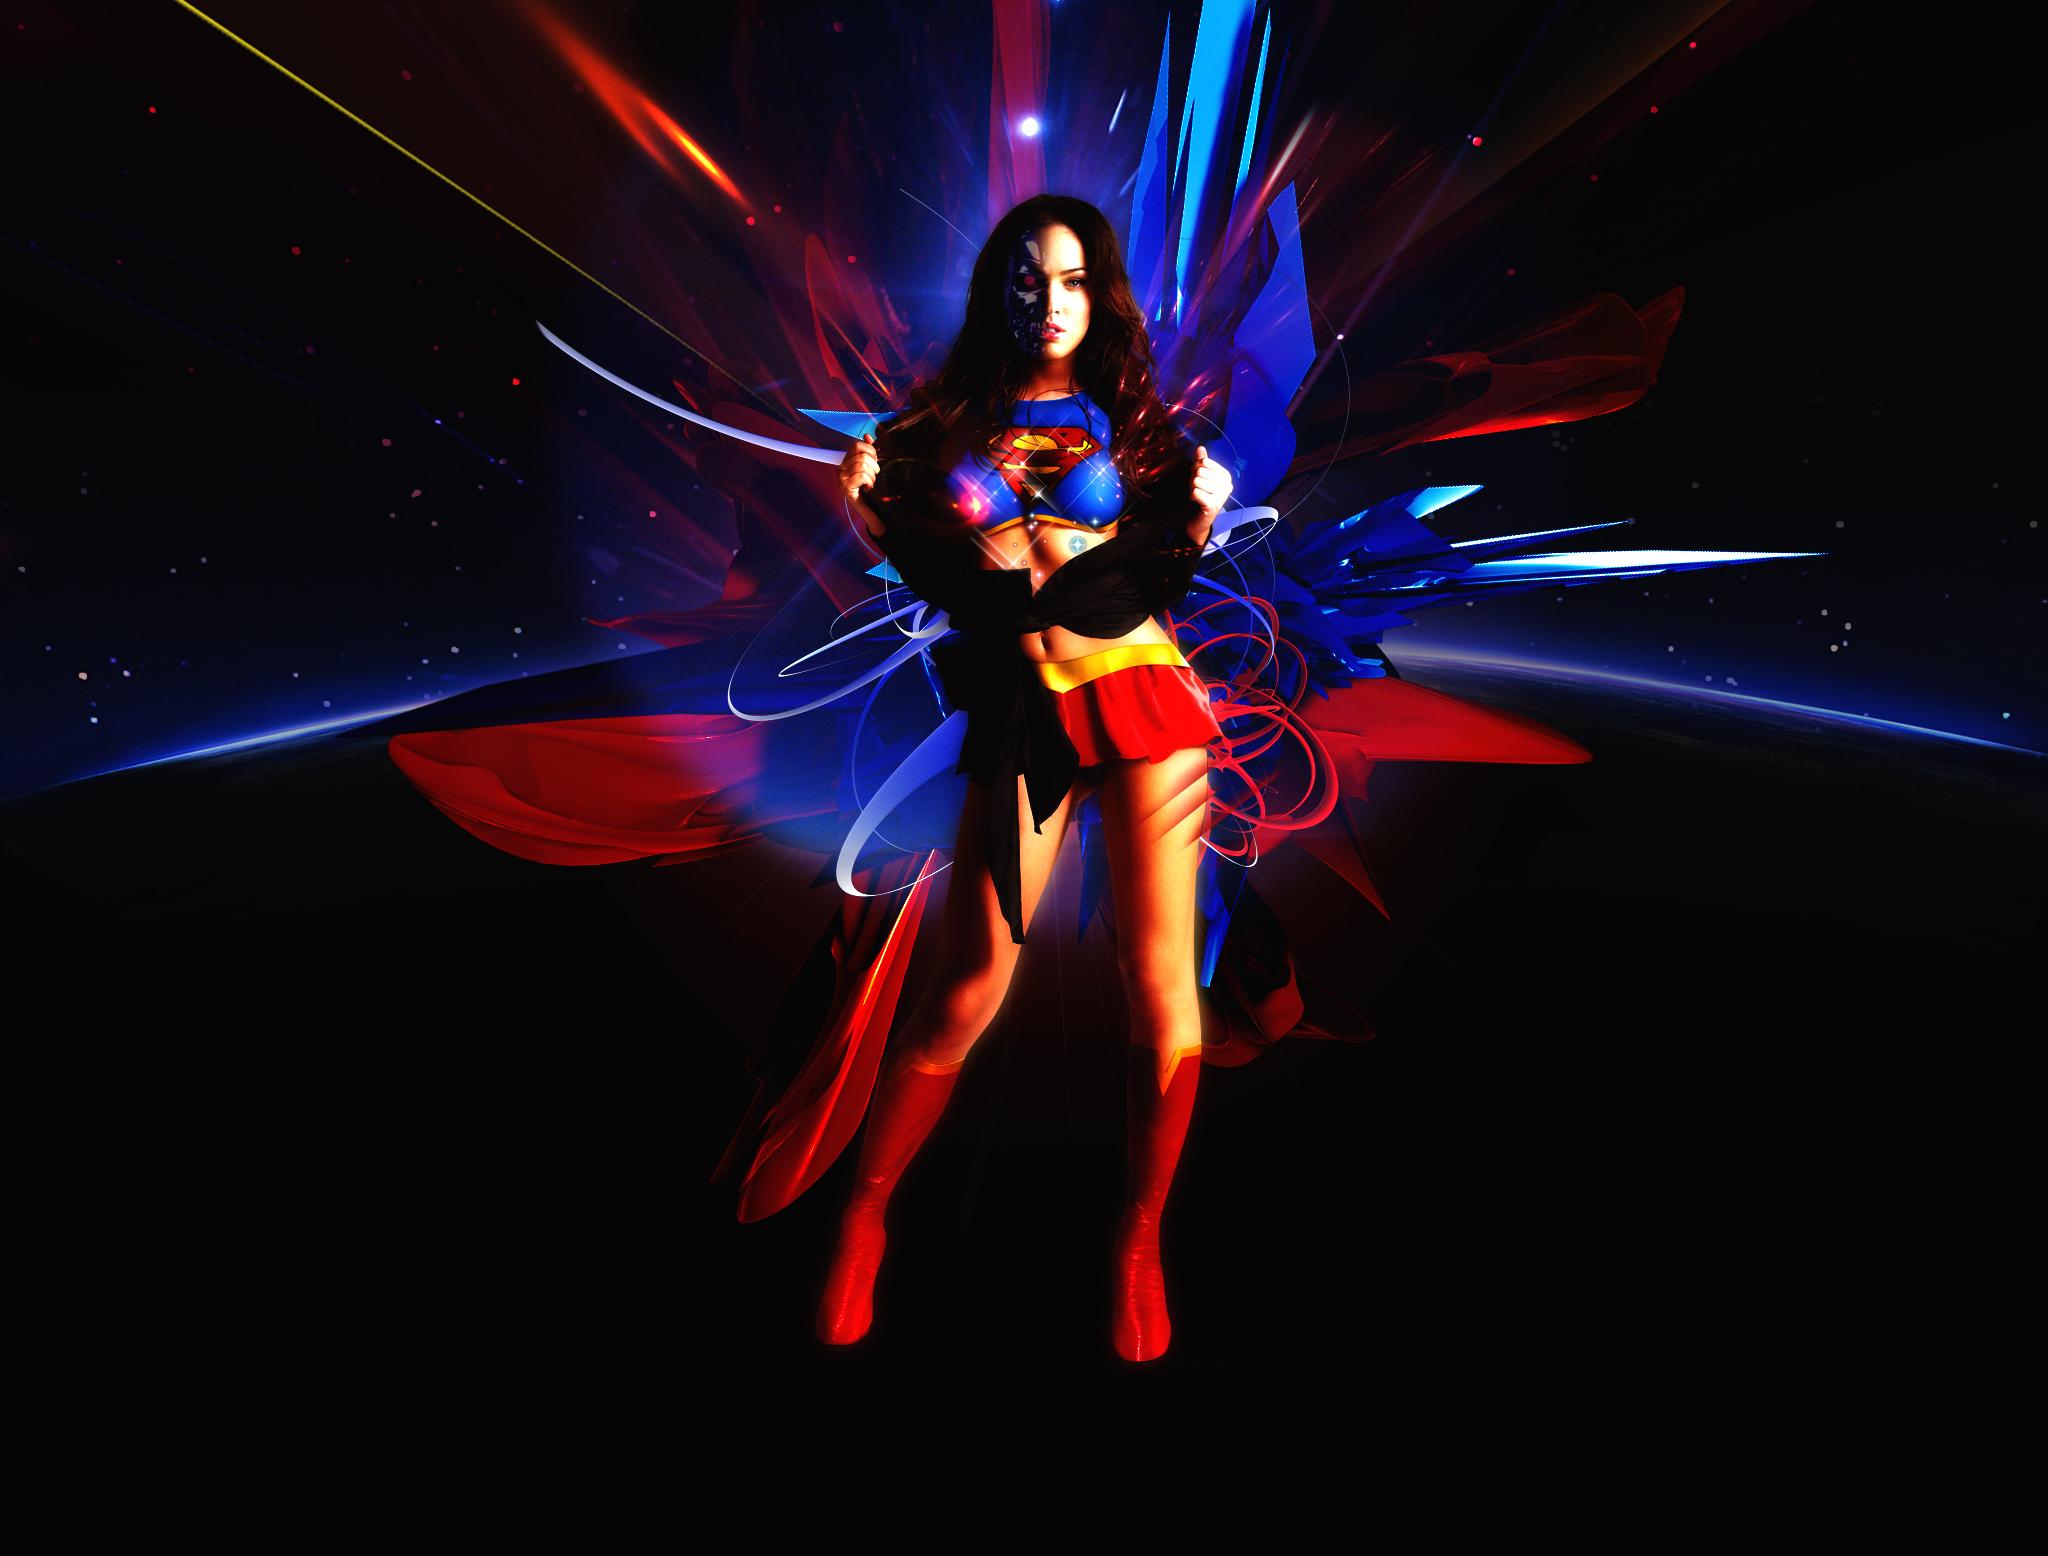 Megan Fox Superwoman Body Paint   Viewing Gallery 2048x1556